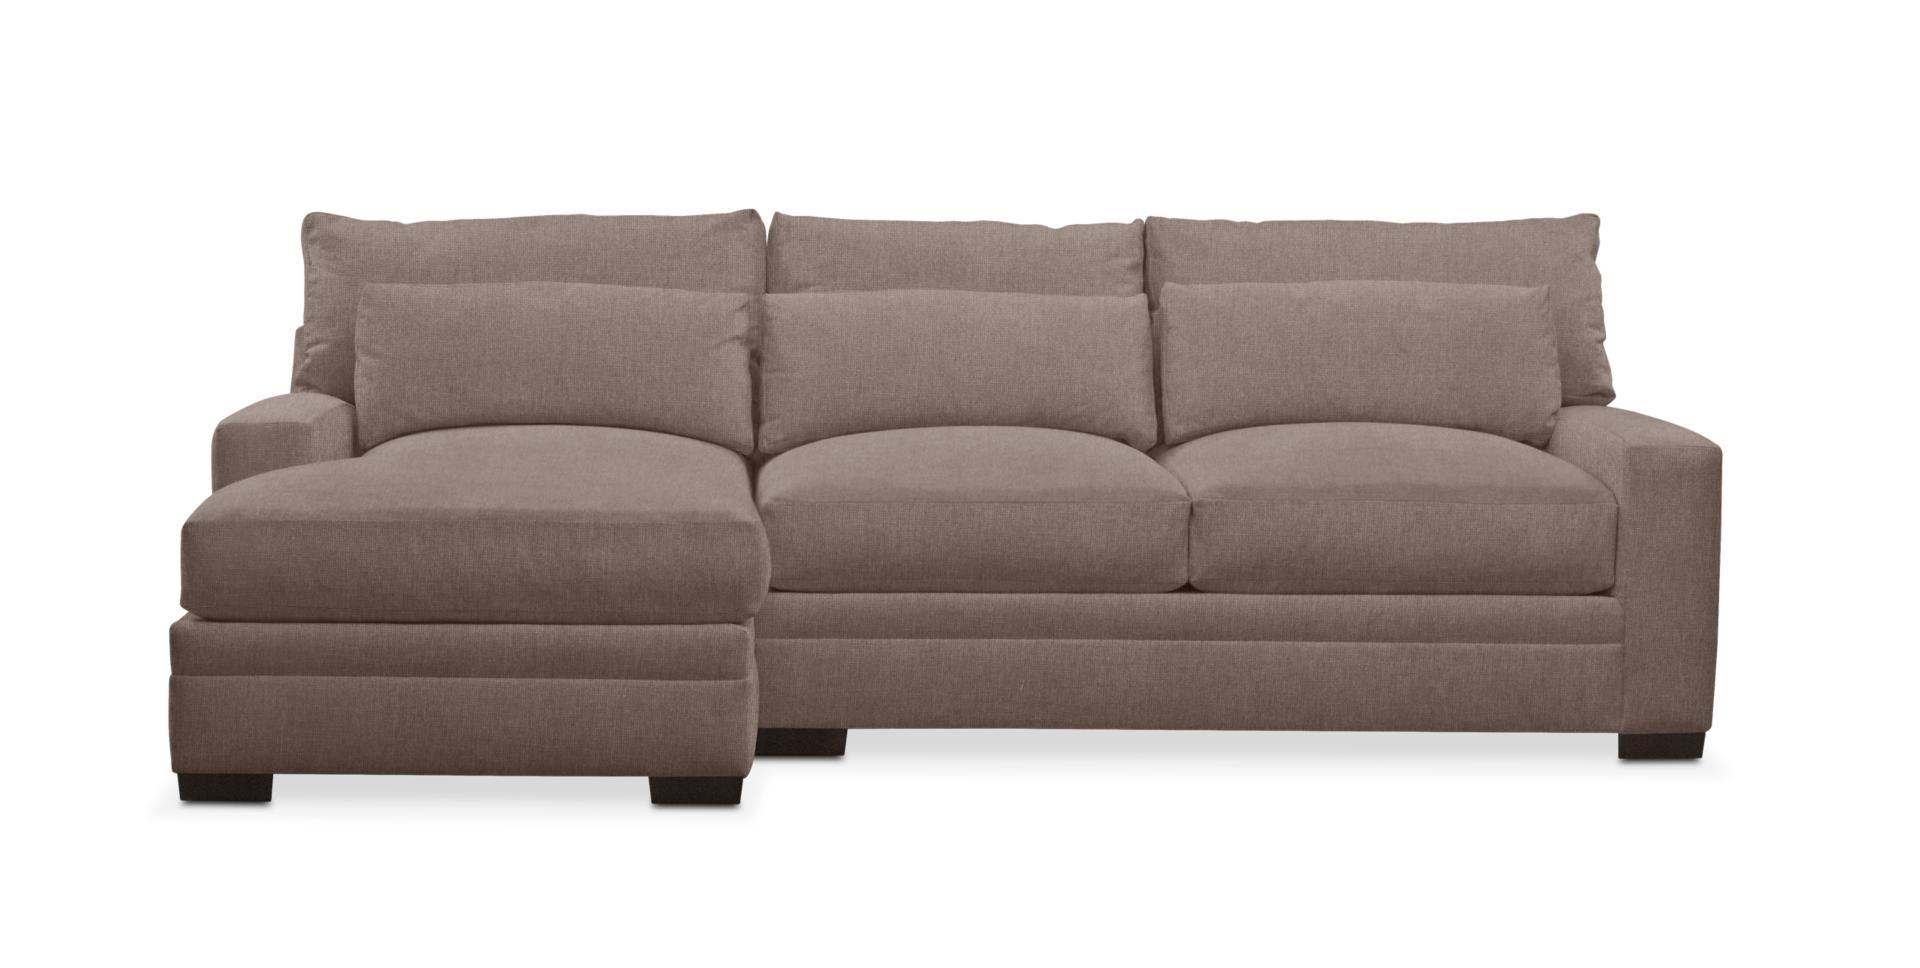 Excellent Winston Cumulus 2 Piece Sectional Sofa With Left Facing Dailytribune Chair Design For Home Dailytribuneorg